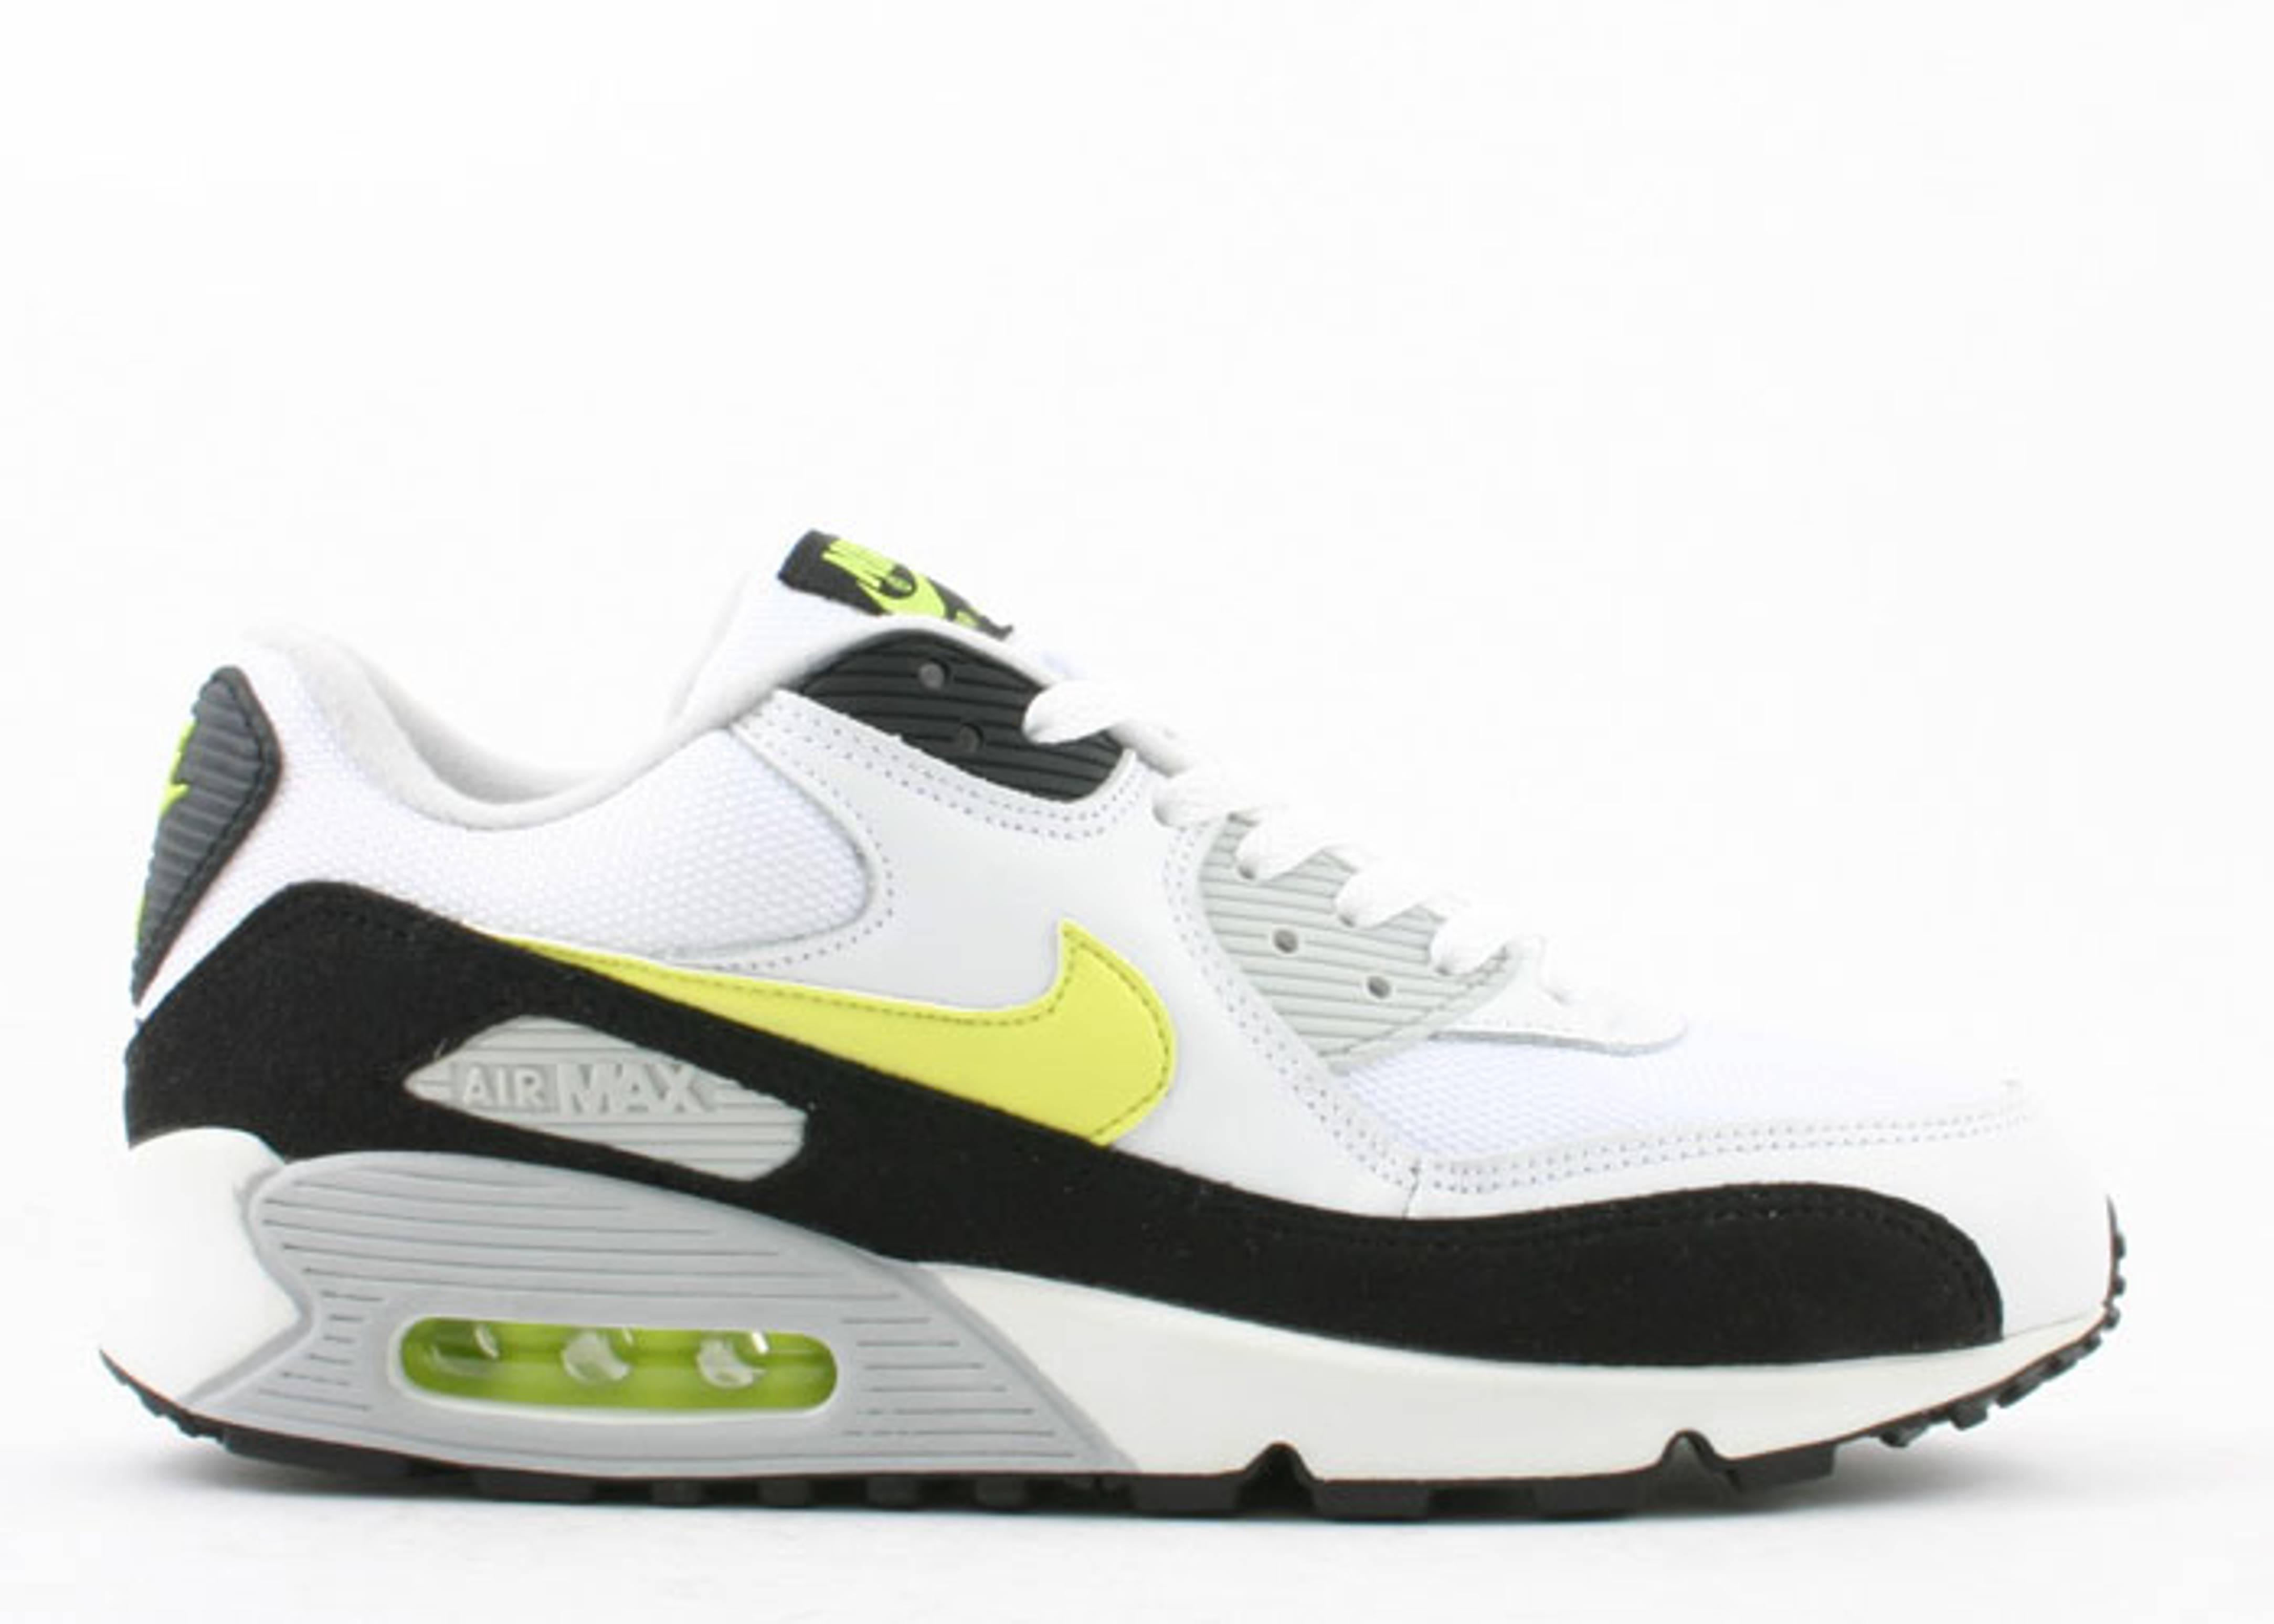 low priced 106c4 c19d2 Air Max 90 - Nike - 307905 131 - white hot lime-black-neutral grey   Flight  Club